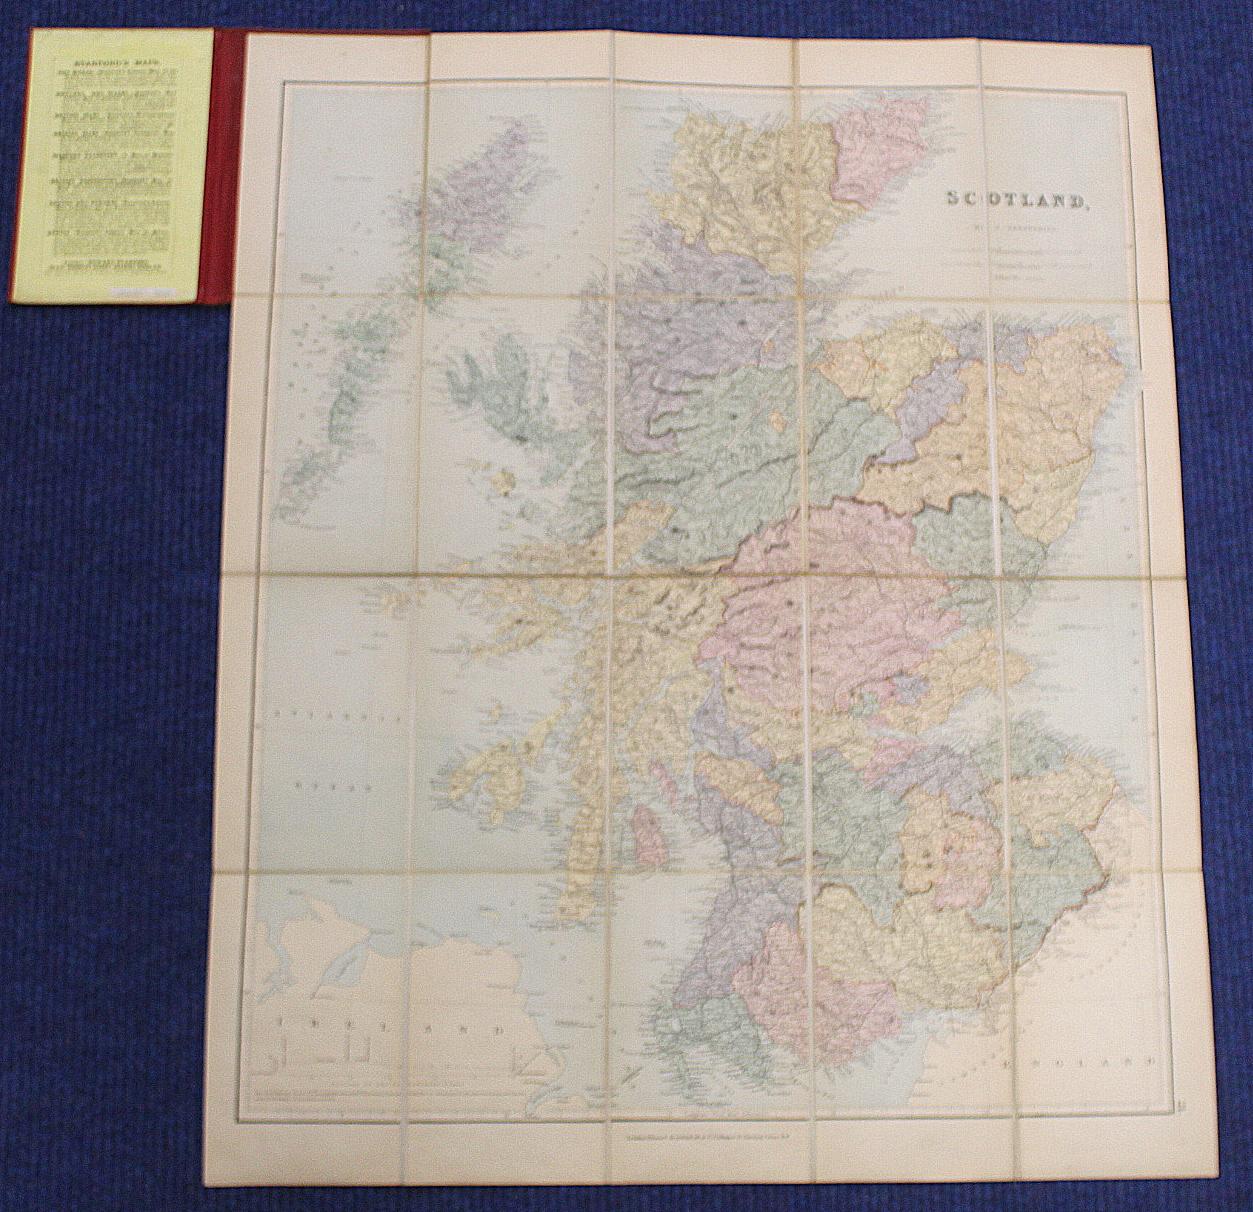 KIRKWOOD J. & SONS.Map of Scotland. Hand col. eng. fldg. linen map in well worn orig. slip case. - Image 23 of 36